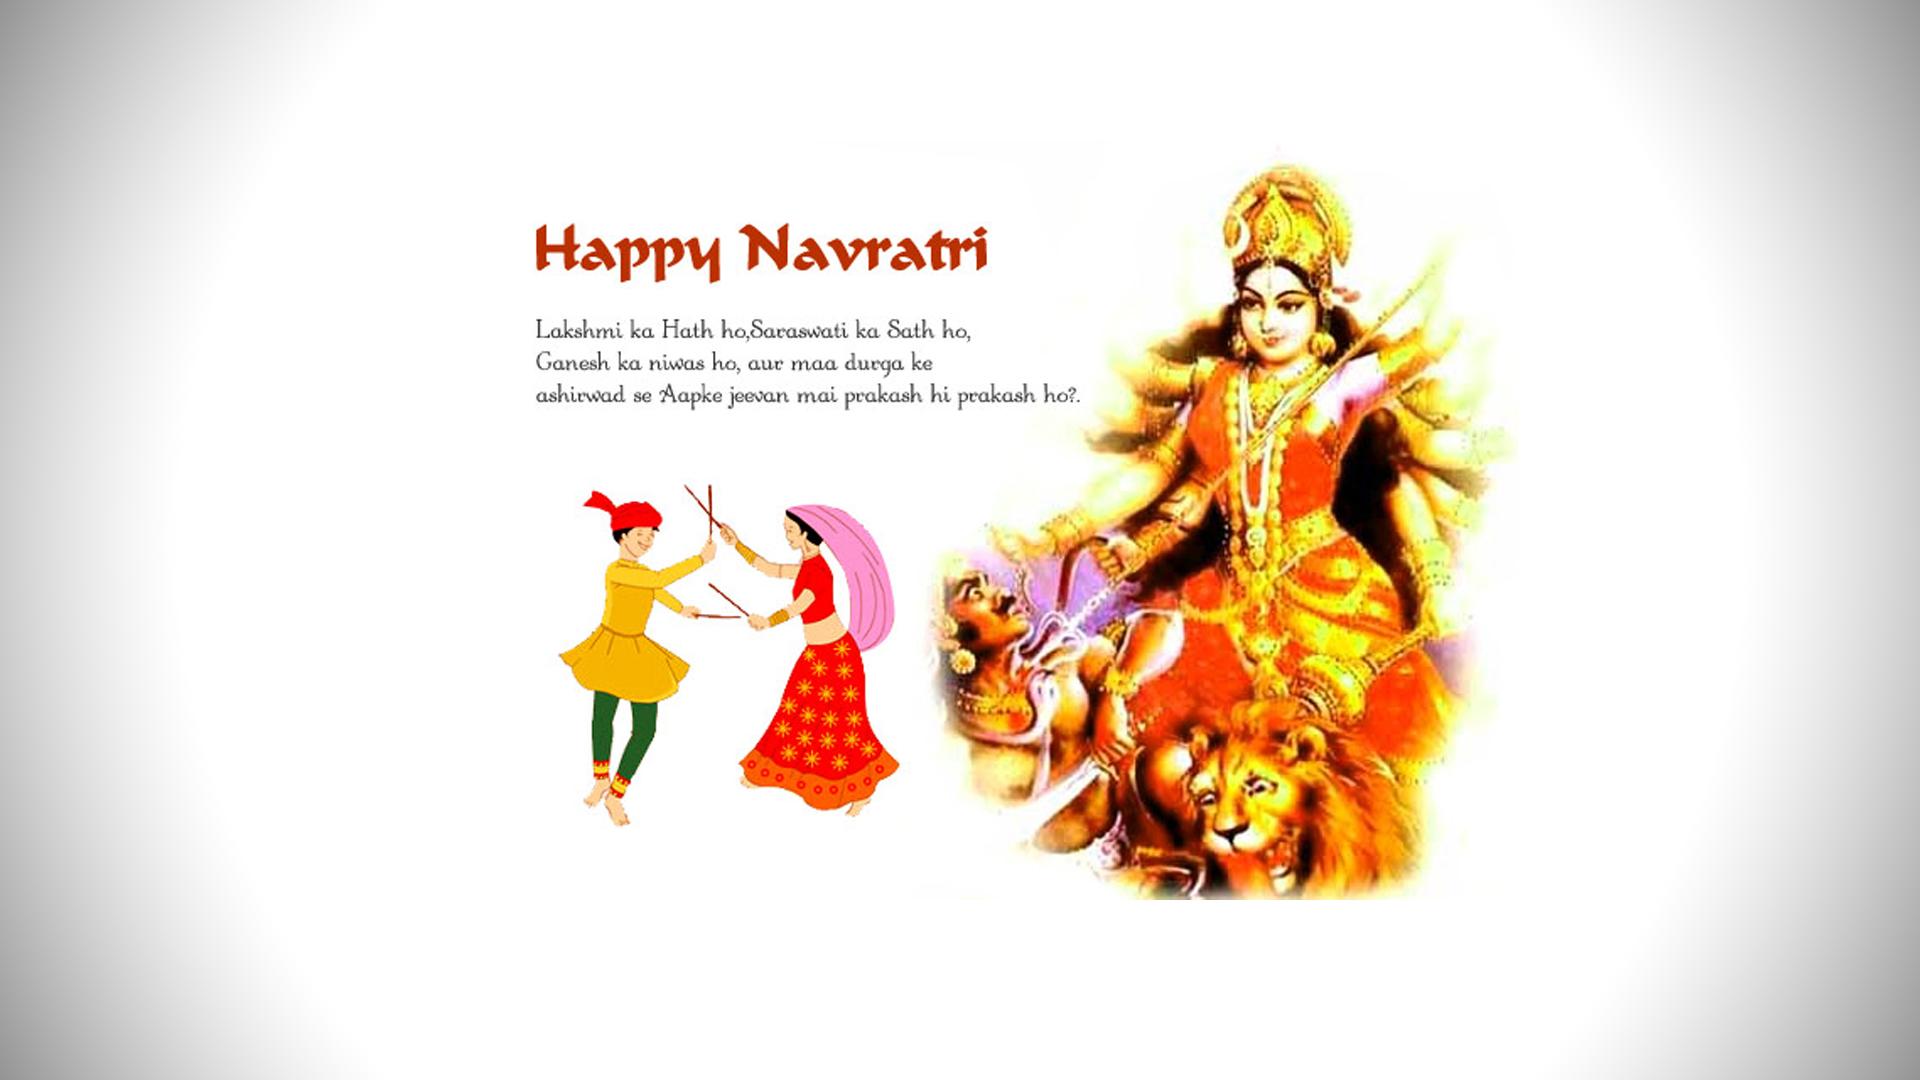 Chaitra Navratri Shubh Muhurat Ghatasthapana Puja Vidhi Timings Date